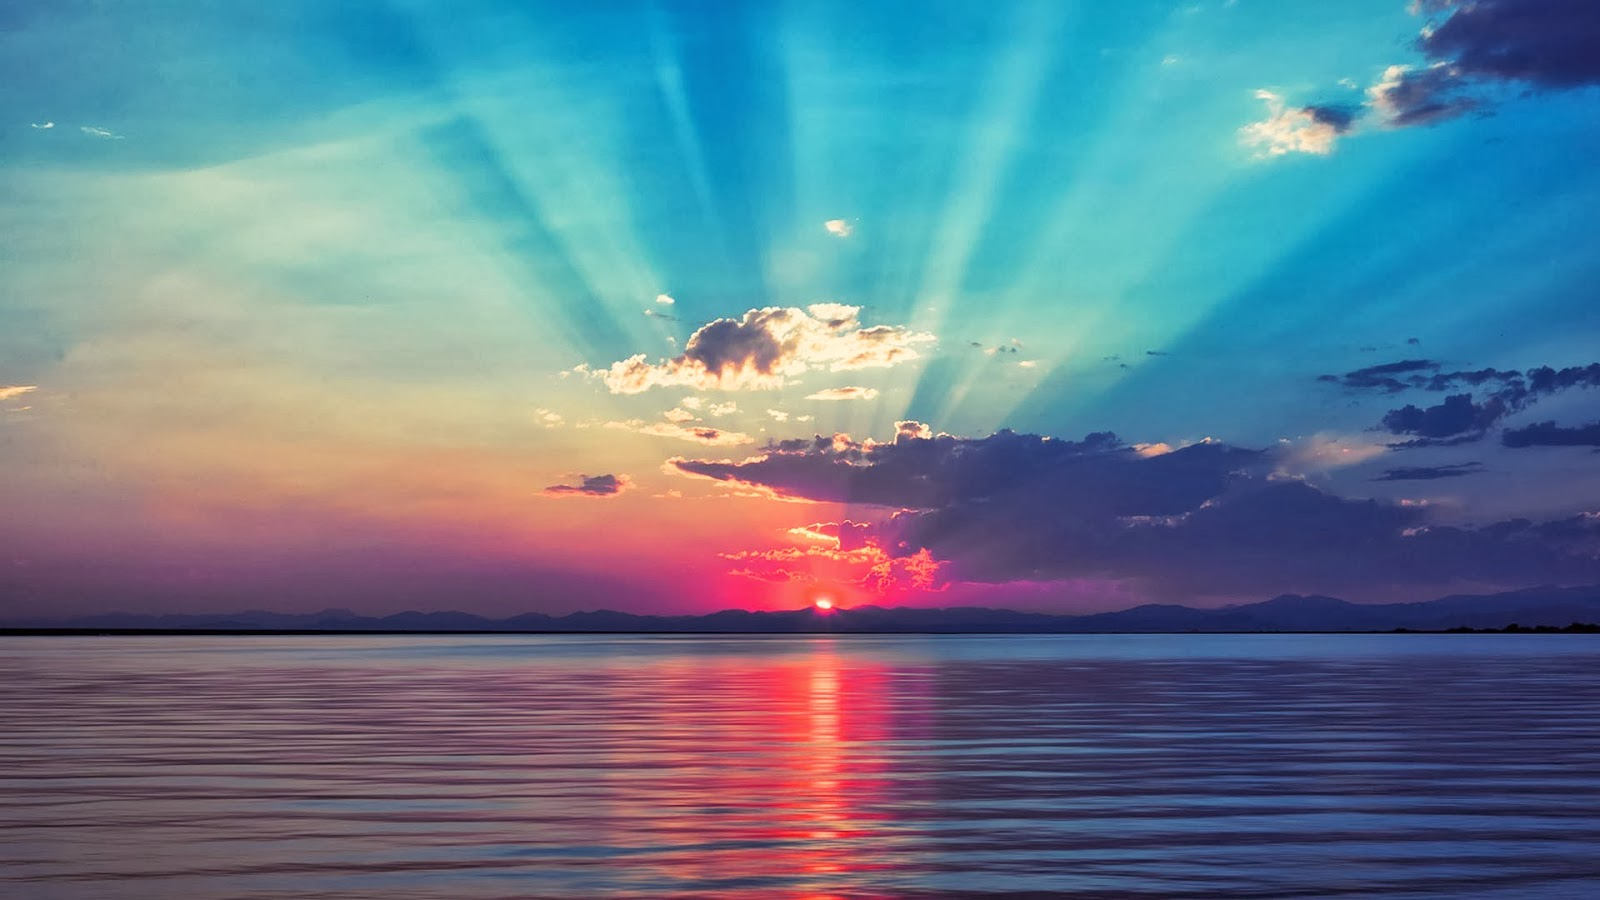 47] Sunrise HD Wallpaper on WallpaperSafari 1600x900